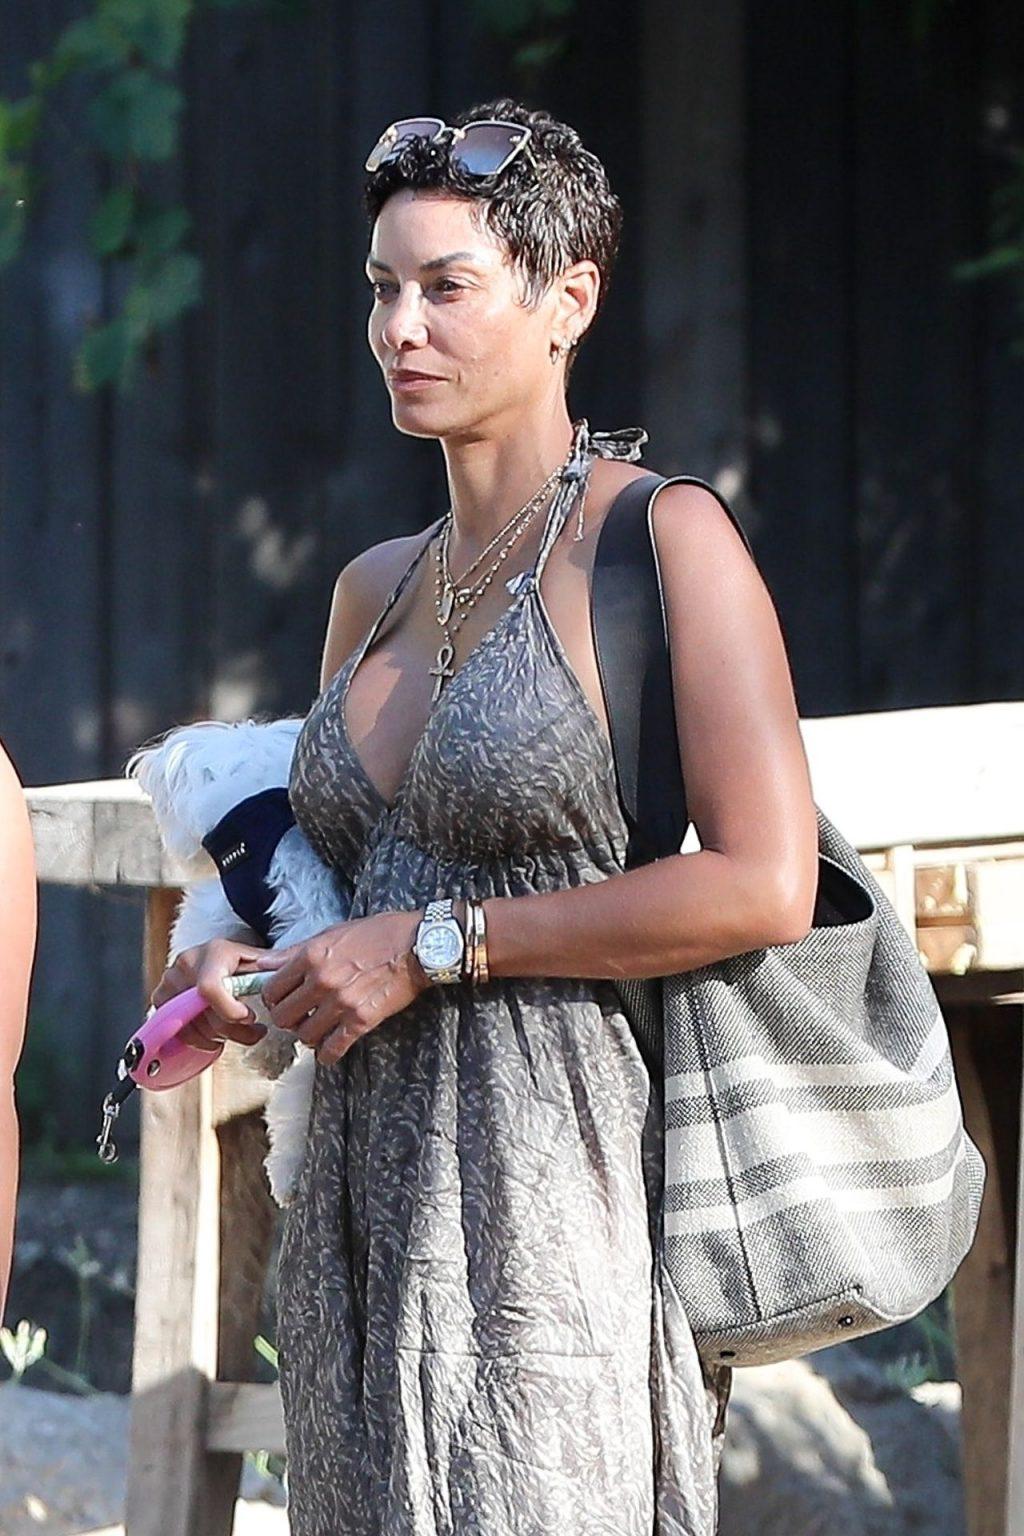 Sexy Nicole Murphy Waits for Her Car as She Leaves Malibu Cafe (17 Photos)